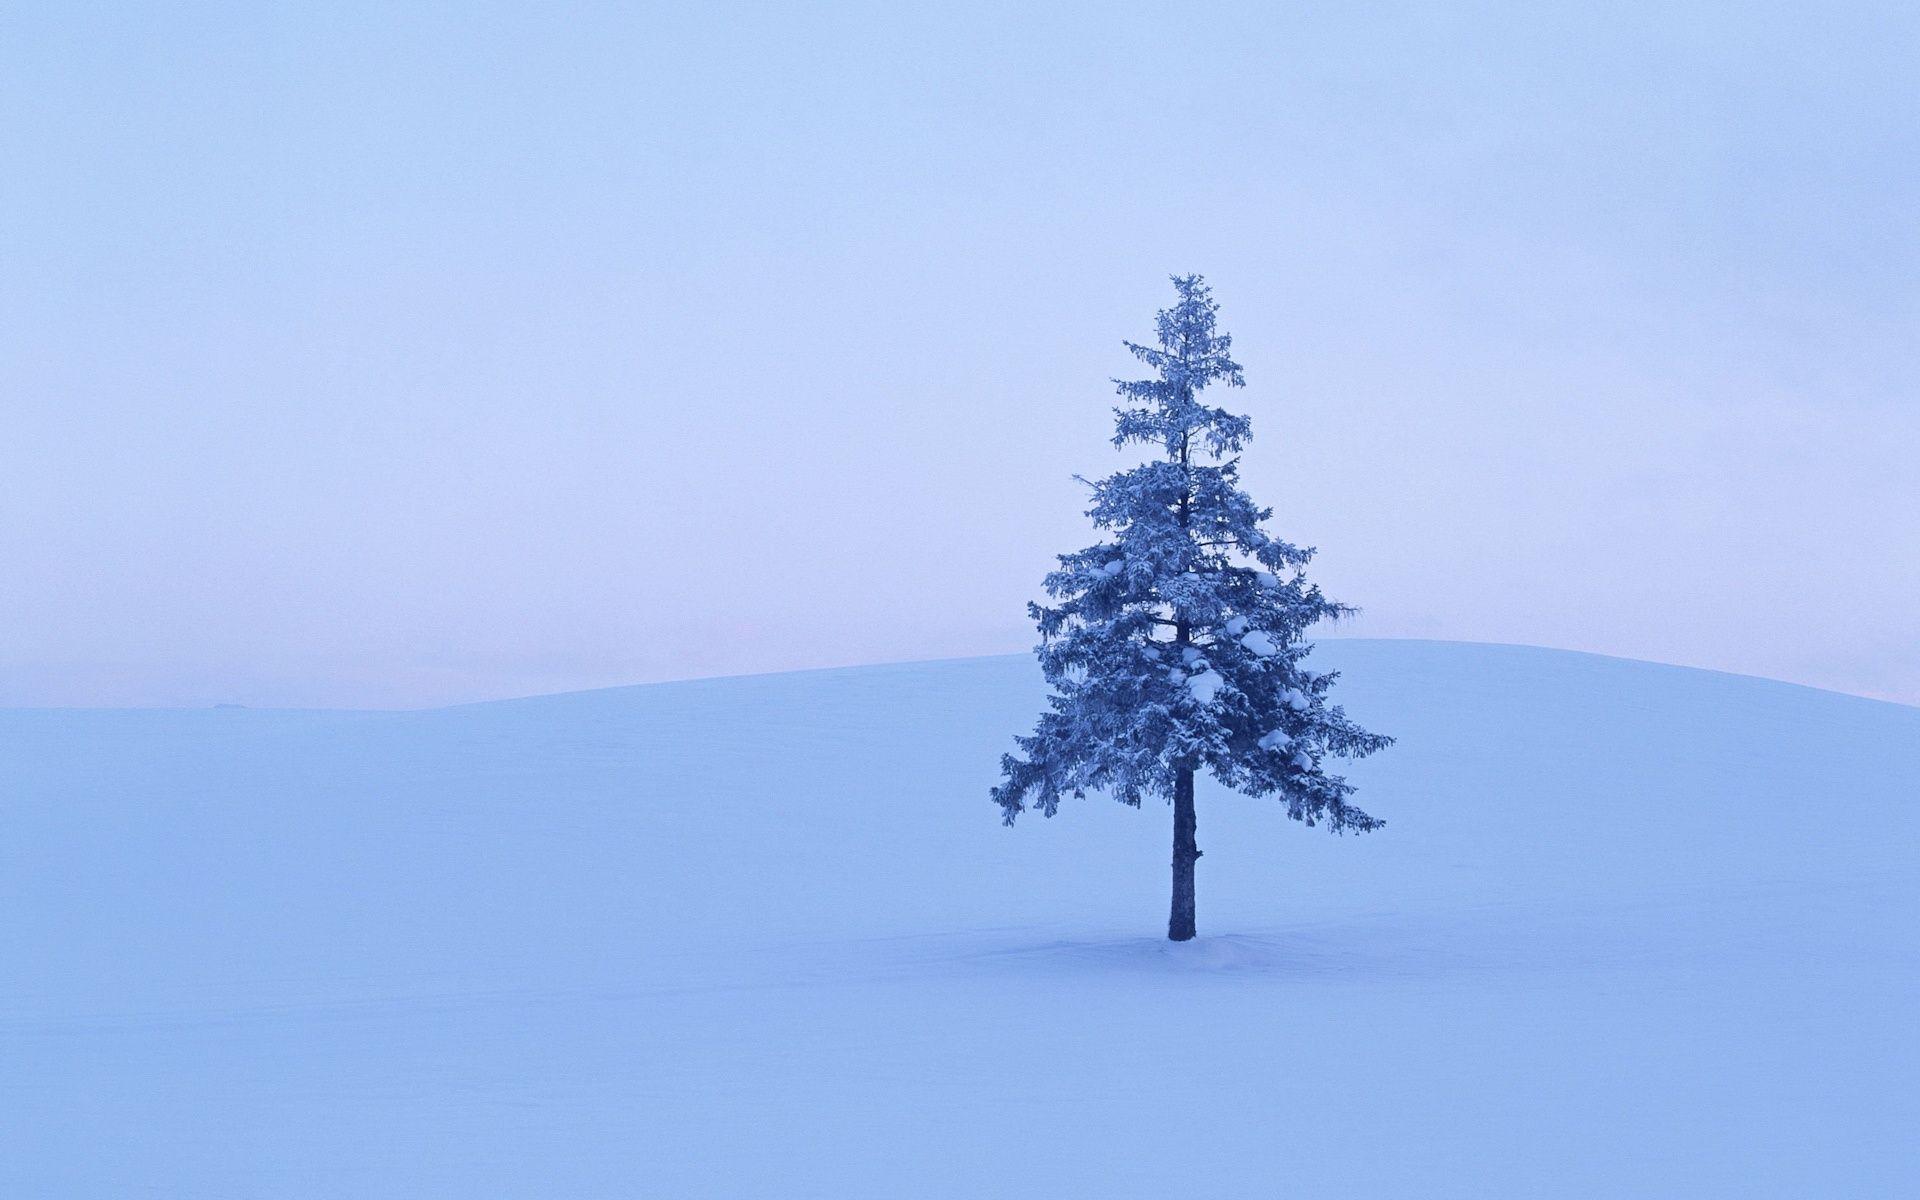 Lonely tree in snowy winter